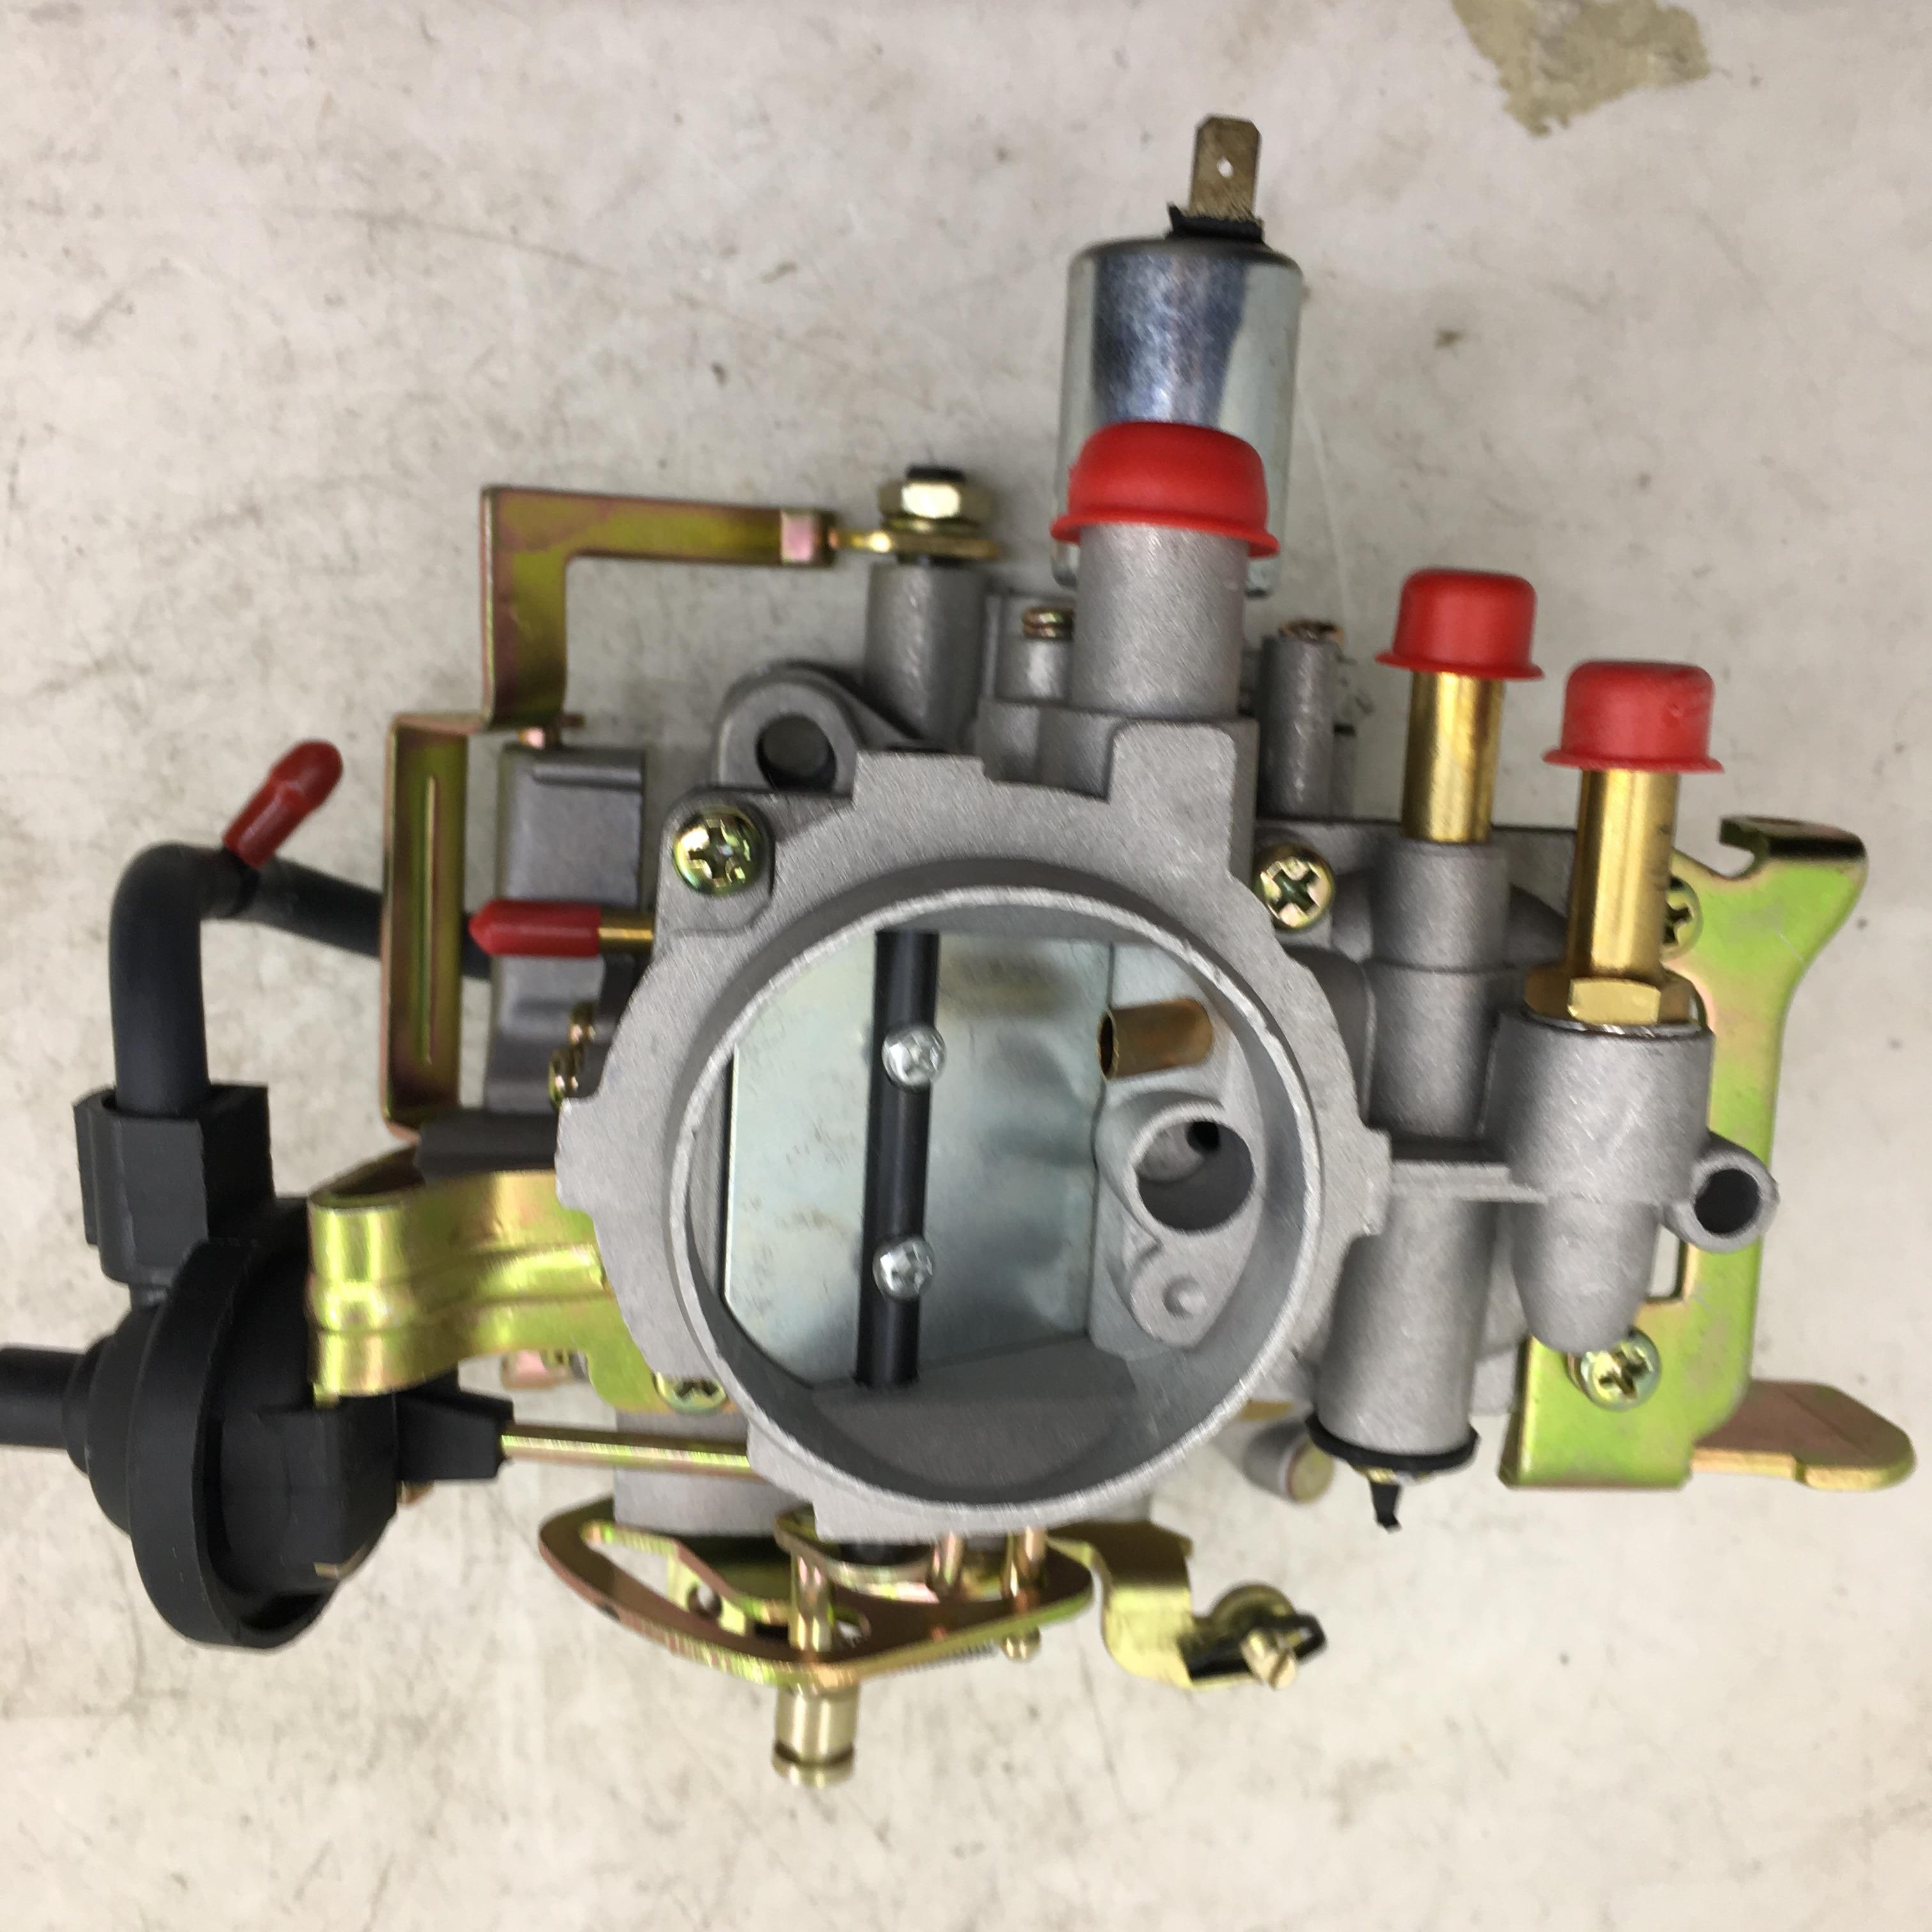 Carburador SherryBerg para SOLEX 32 32mm carburador para Renault express PEUGEOT CITROEN carburador para RENAULT R5 R9 R11